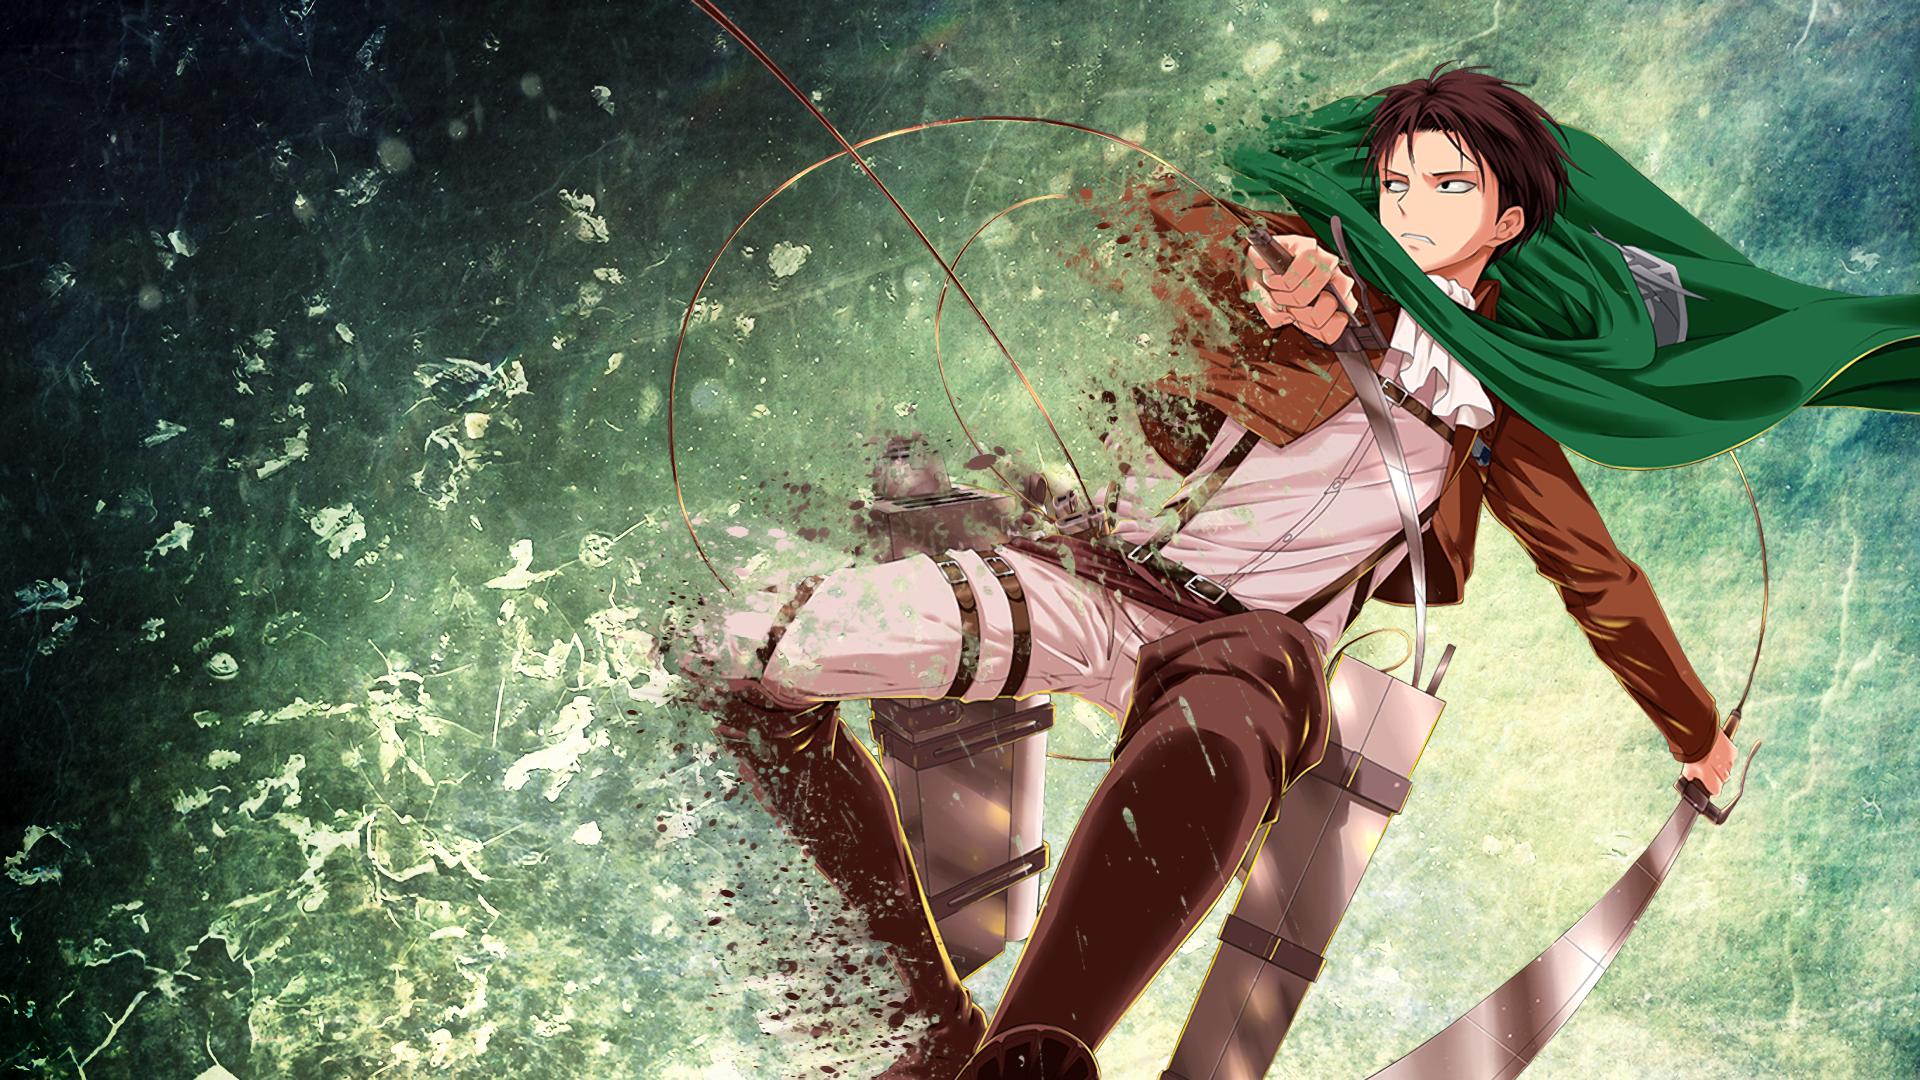 Free Download Anime Attack On Titan Levi Ackerman Wallpaper Attack On Titan 1920x1080 For Your Desktop Mobile Tablet Explore 38 Corporal Wallpaper Corporal Wallpaper